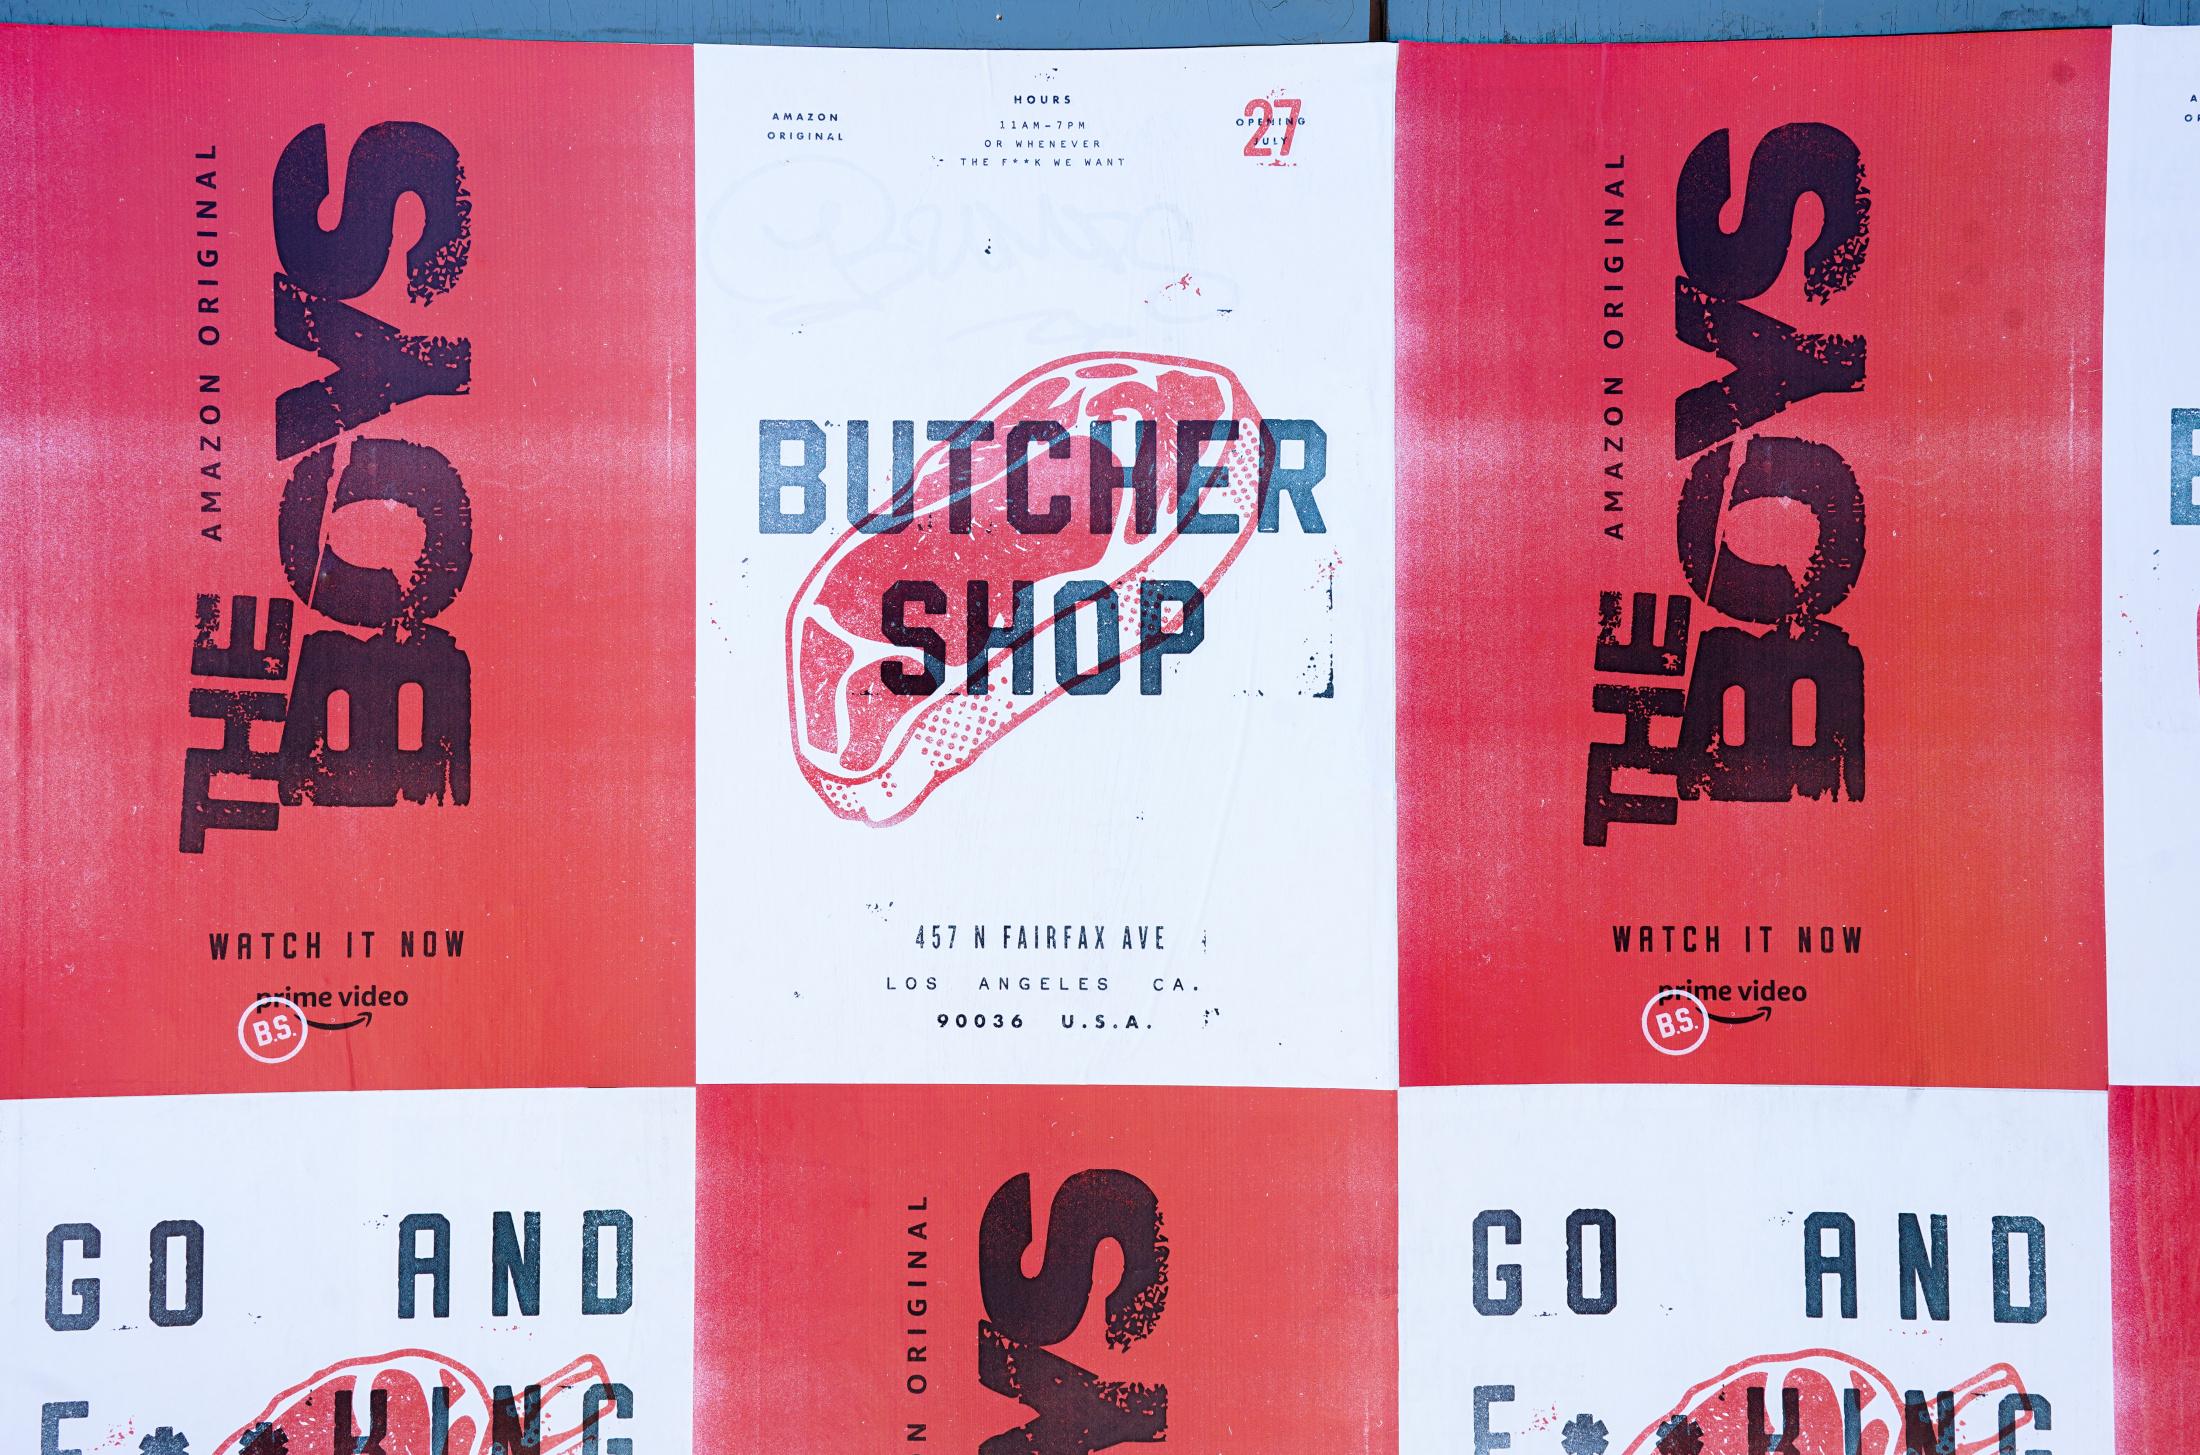 Thumbnail for The Boys - Butcher Shop